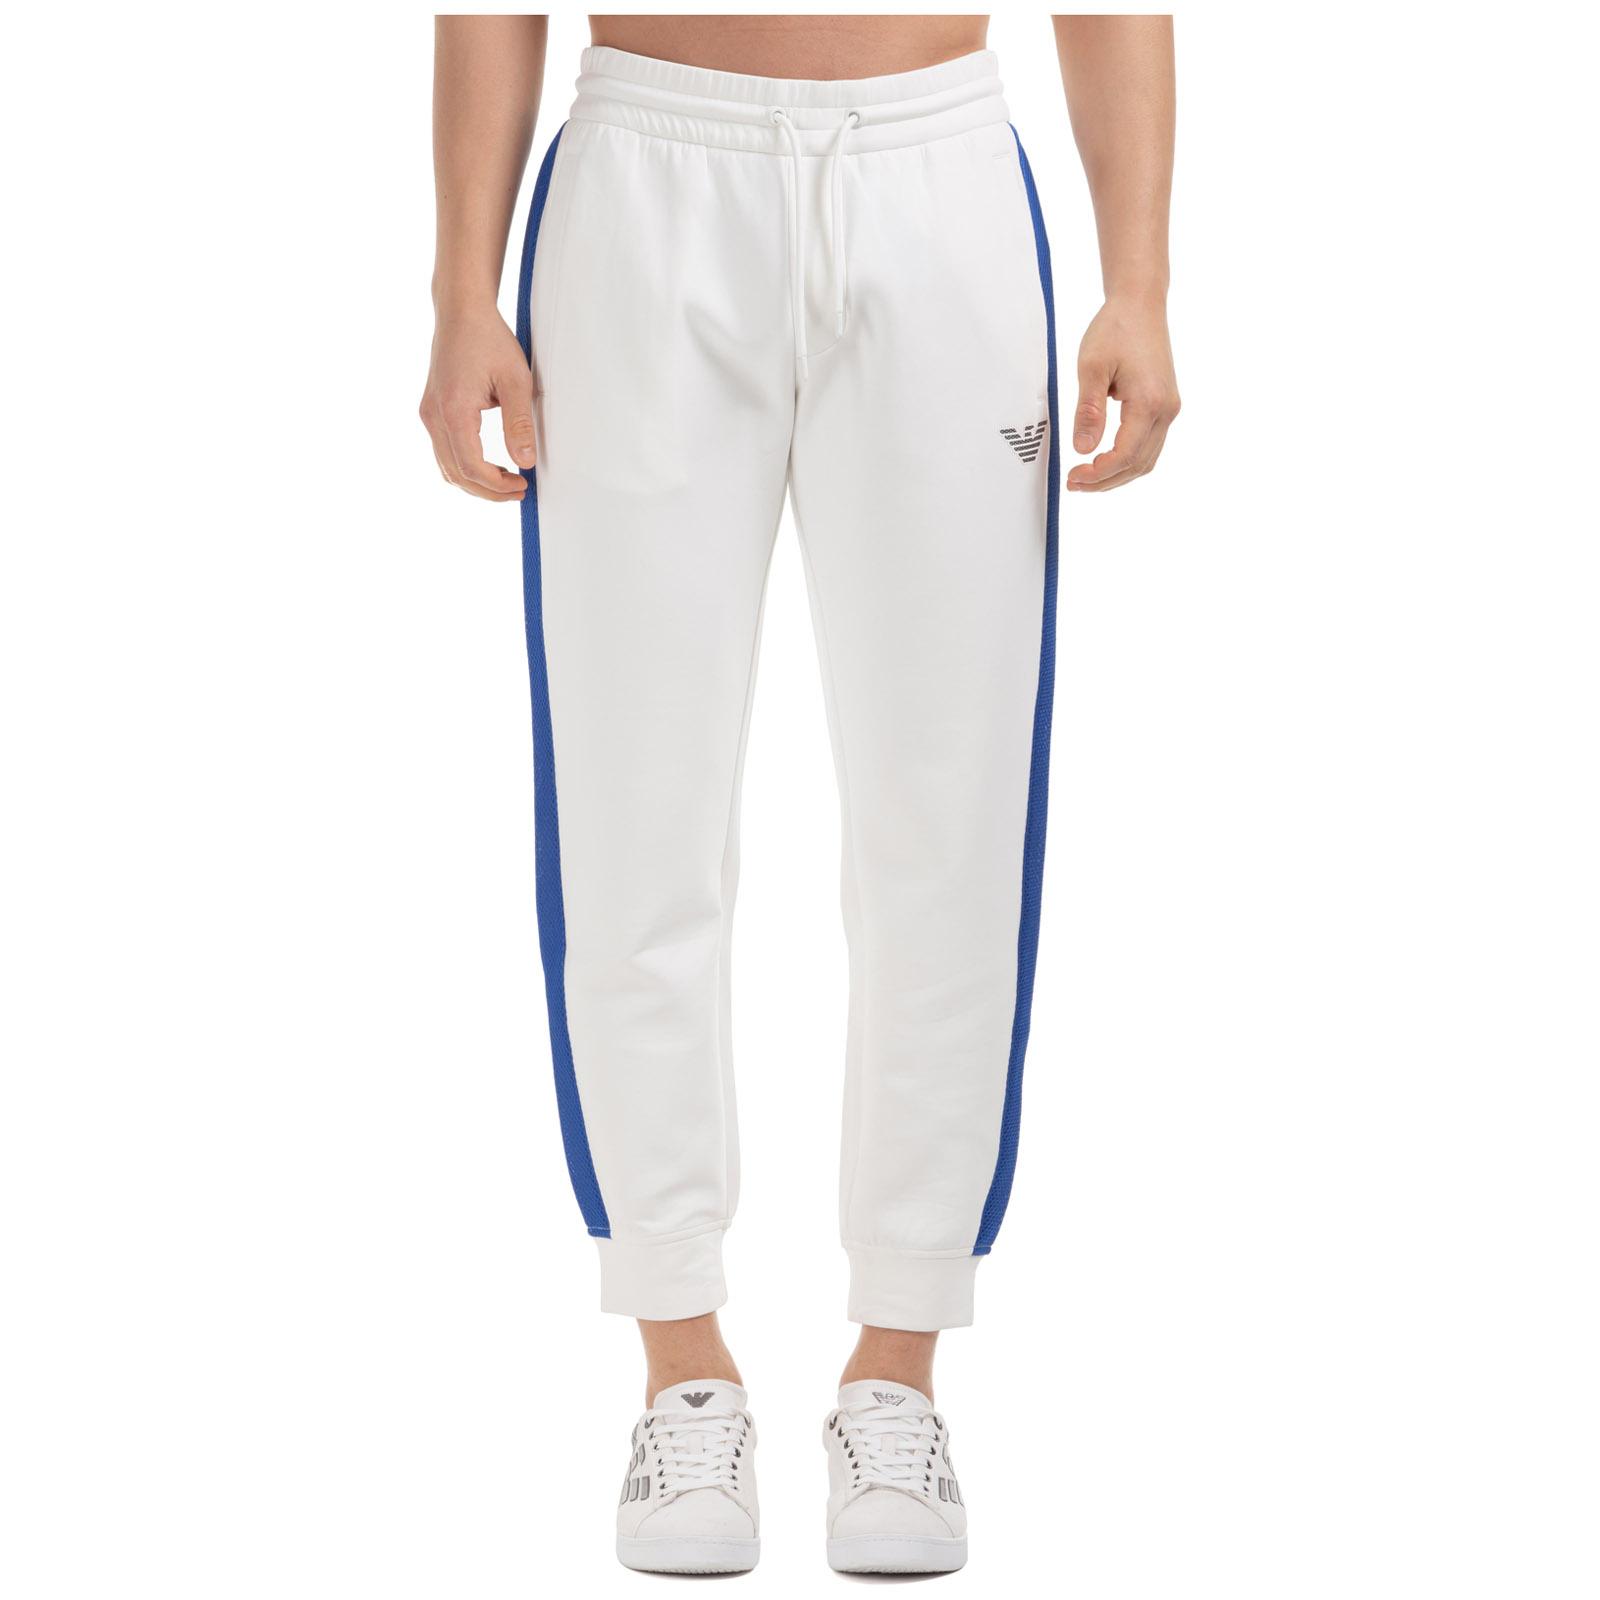 Emporio Armani Men's sport tracksuit trousers  - White - Size: Medium